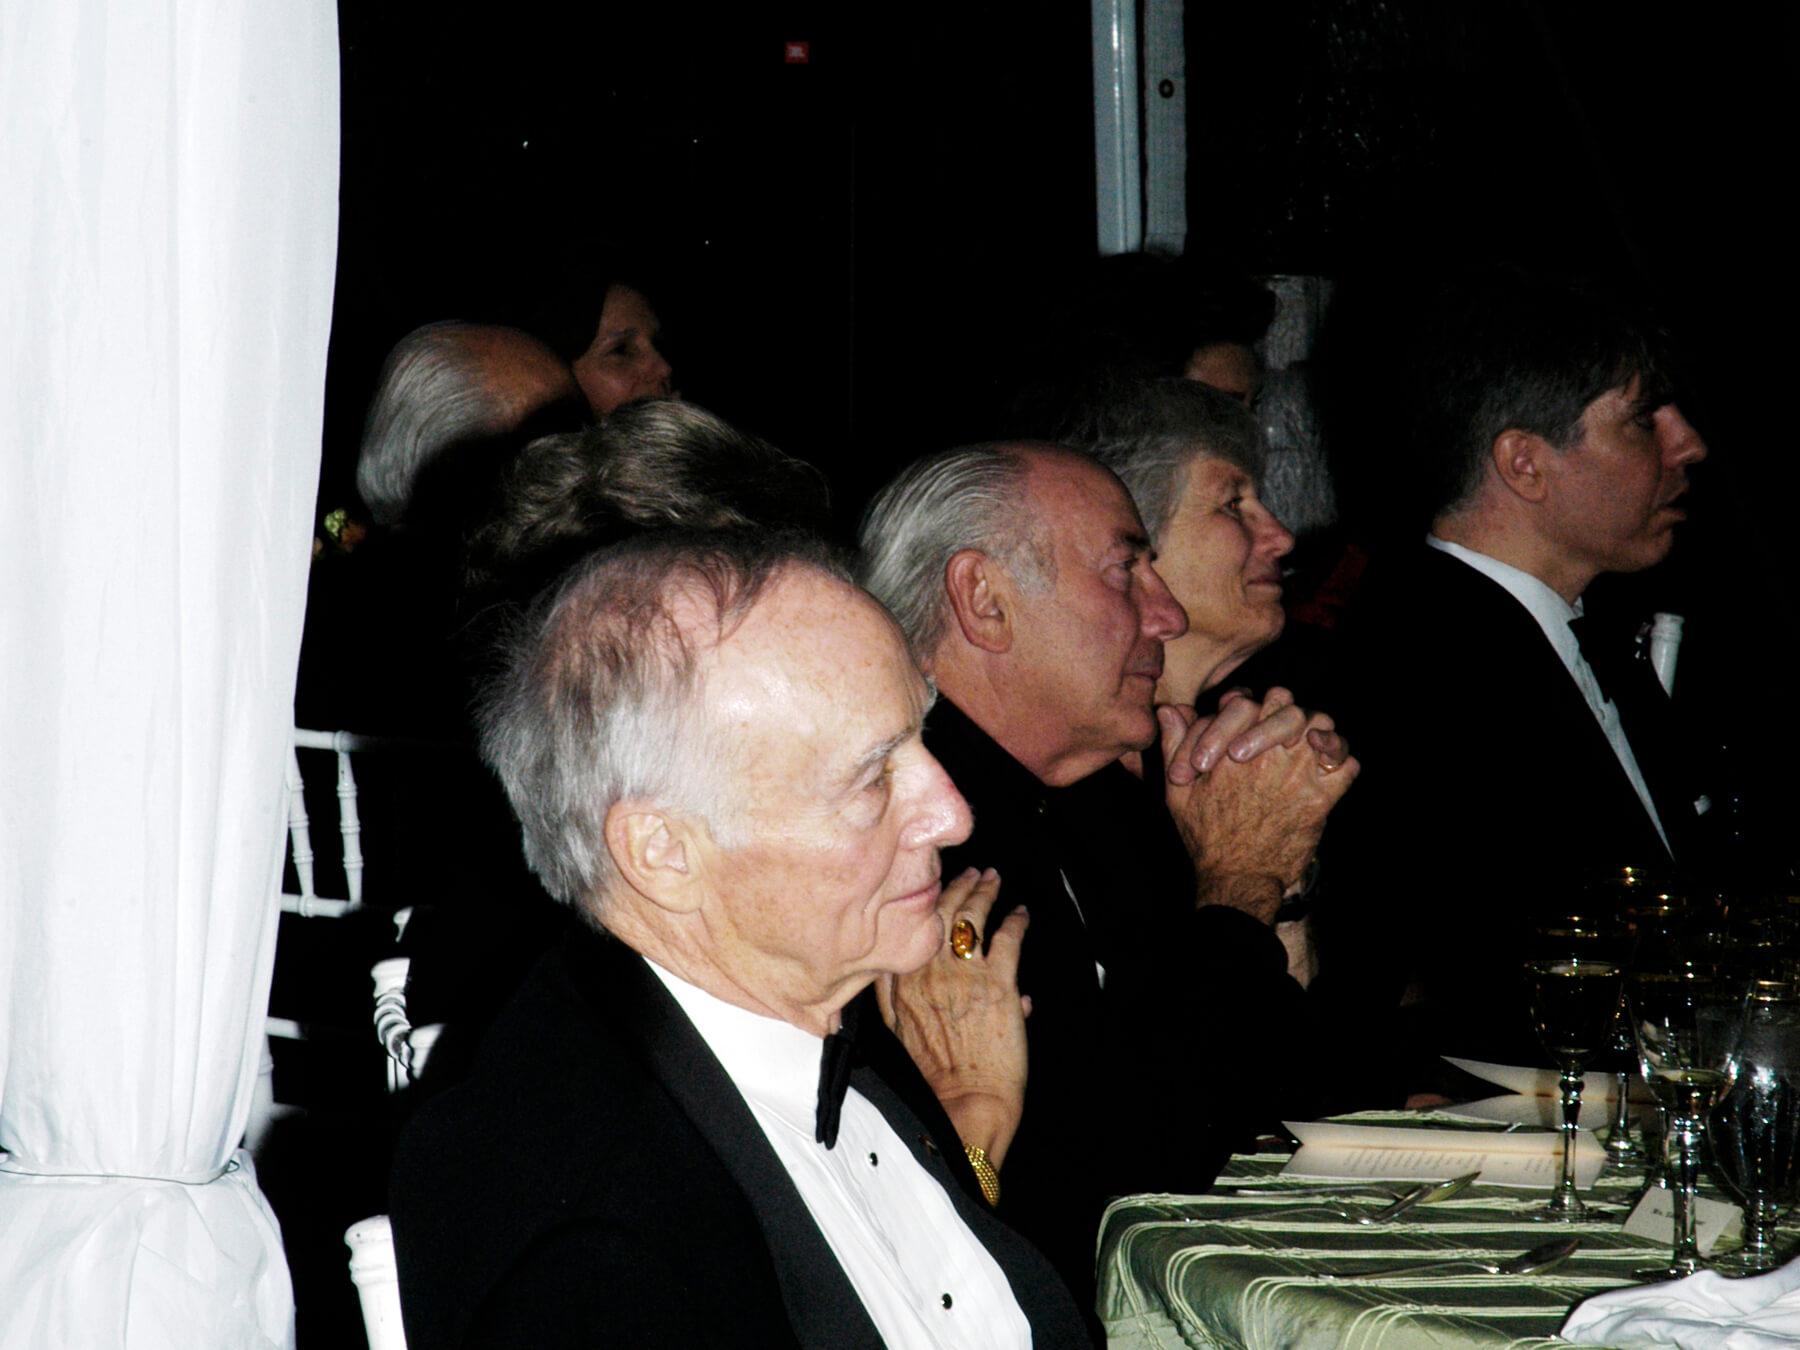 Amb. George Herbert Walker, Mr. Julius Joe Adorjan, Mrs. Carol Walker, Mr. Maximilian Teleki